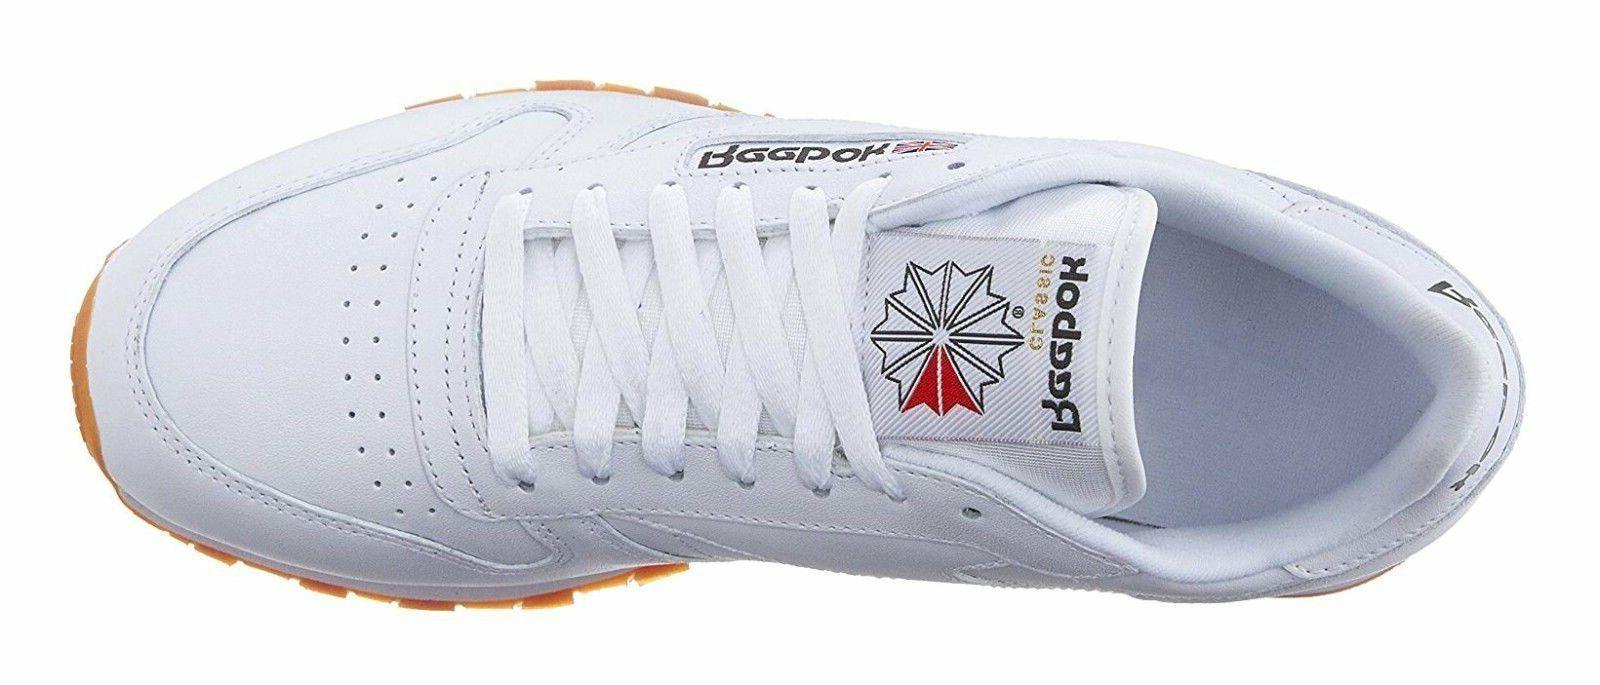 Reebok Classic Gum Tennis Shoes 49797